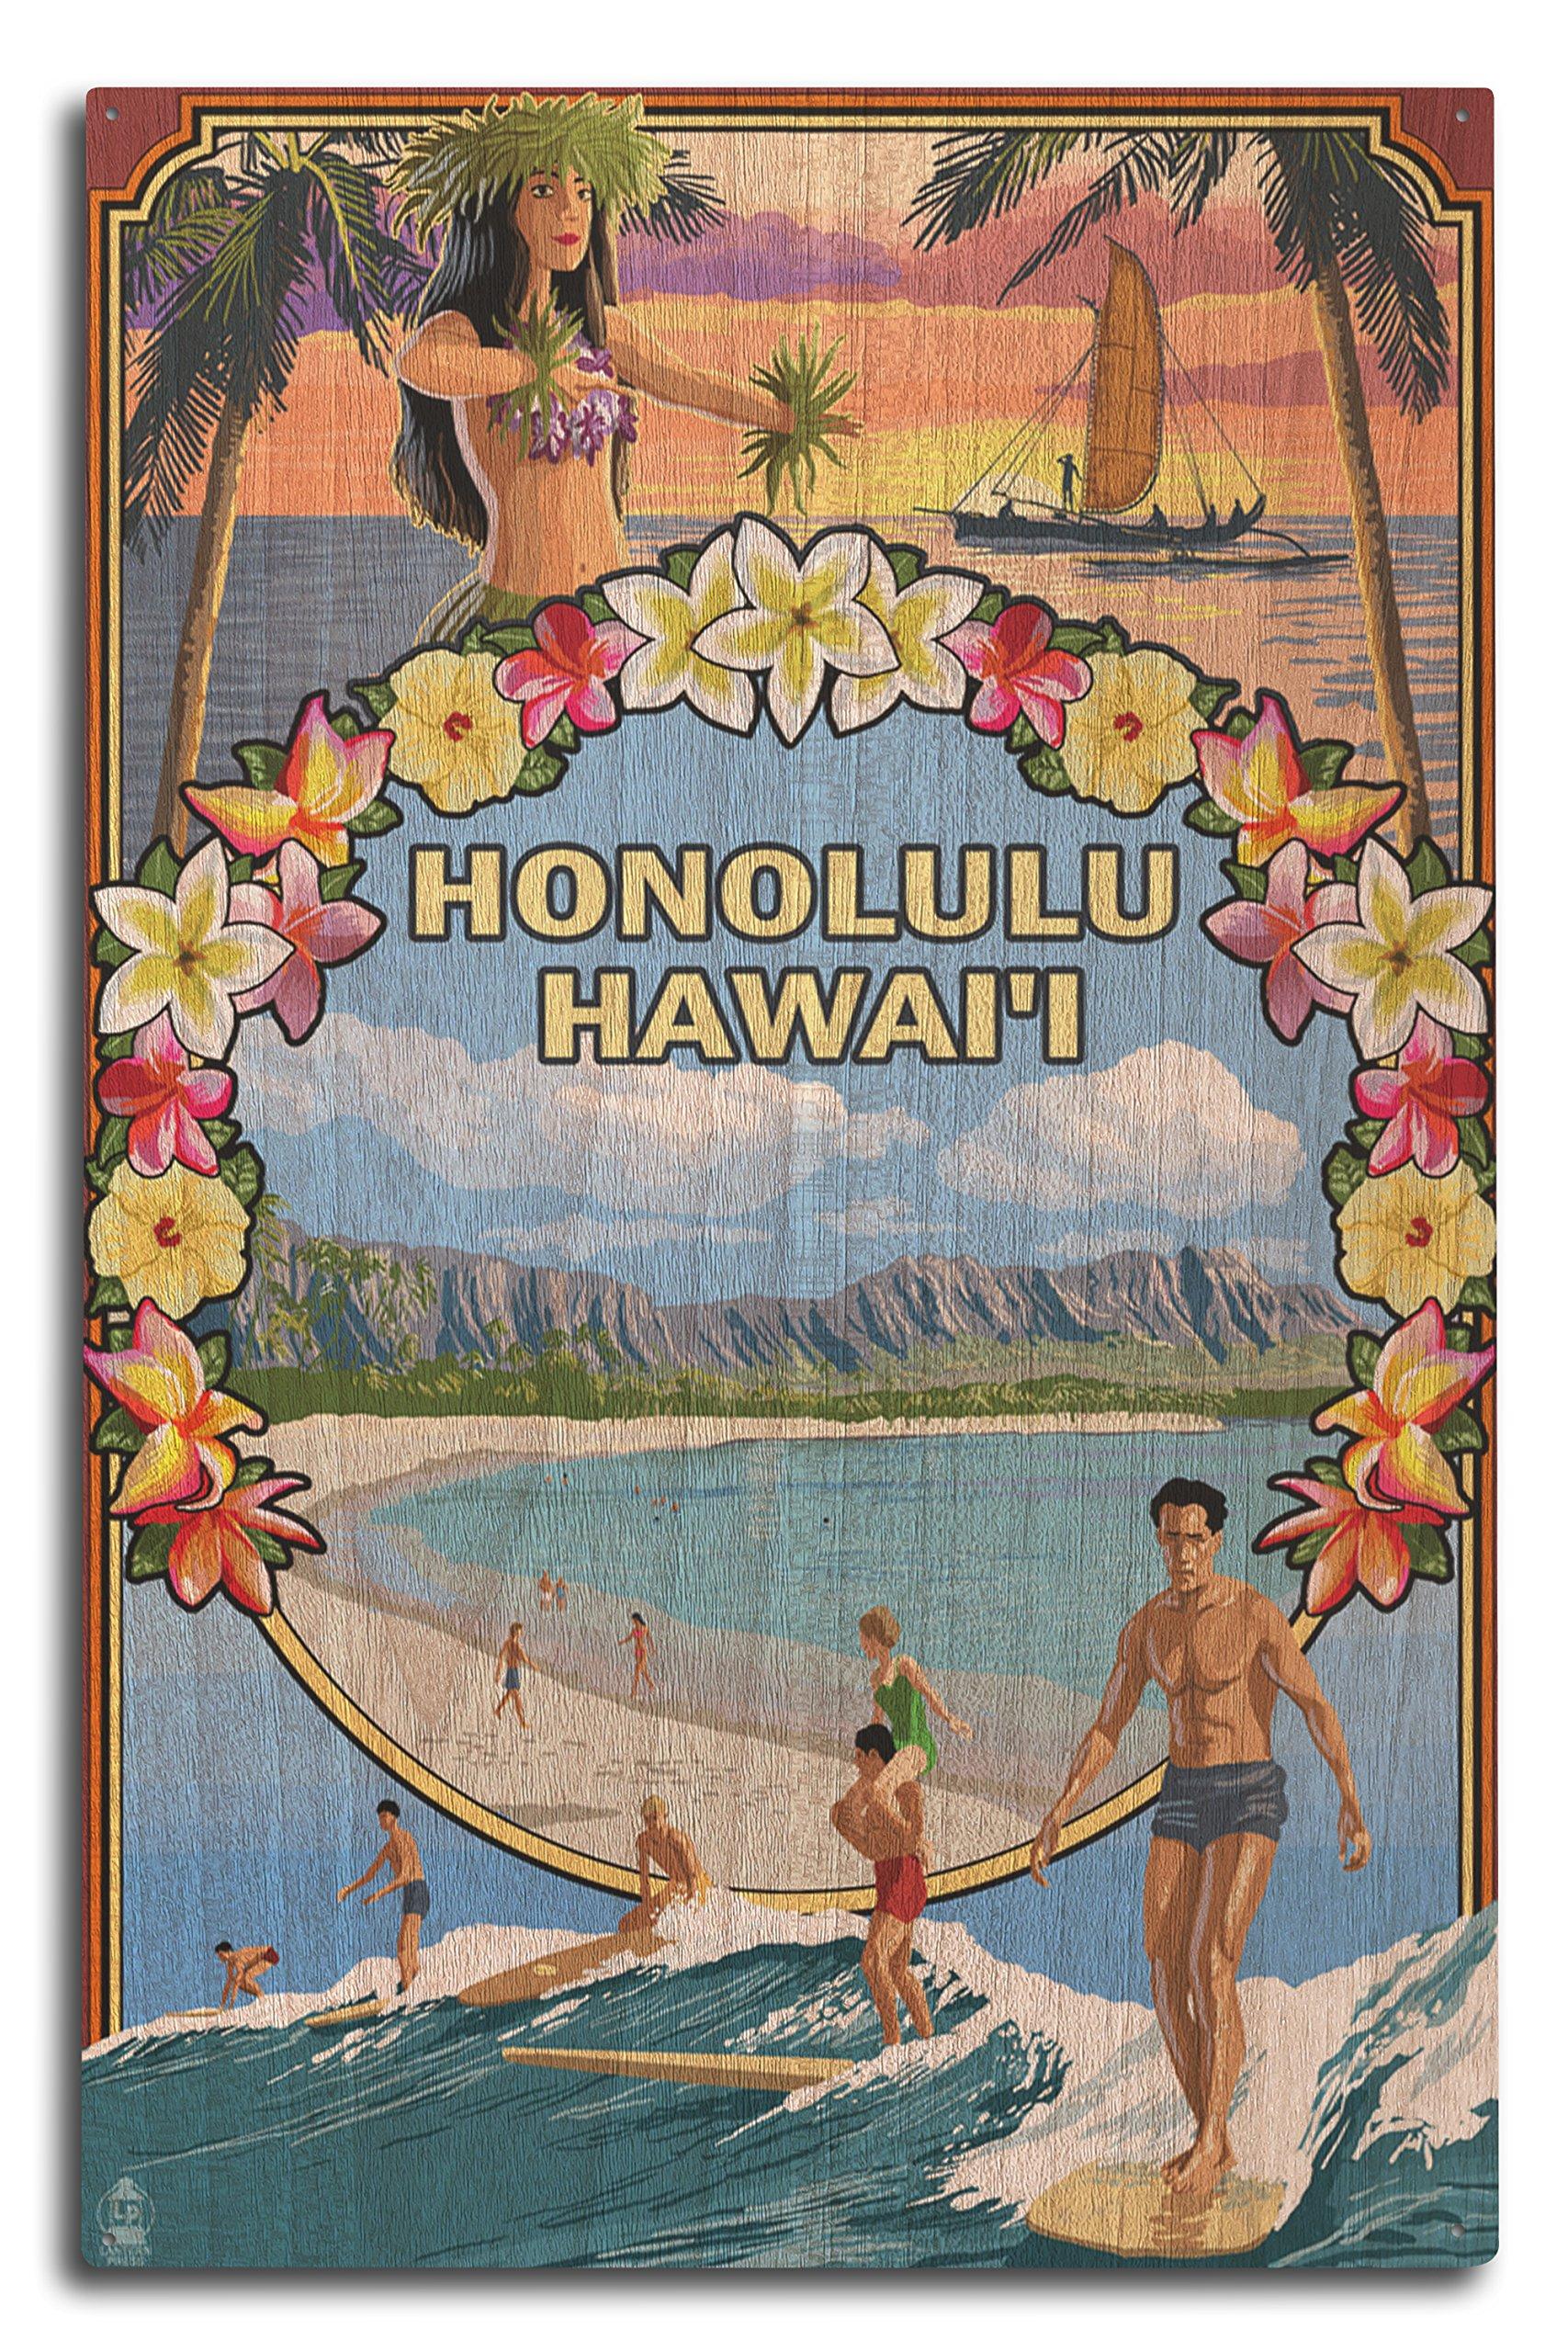 Honolulu, Hawaii - Montage (10x15 Wood Wall Sign, Wall Decor Ready to Hang)